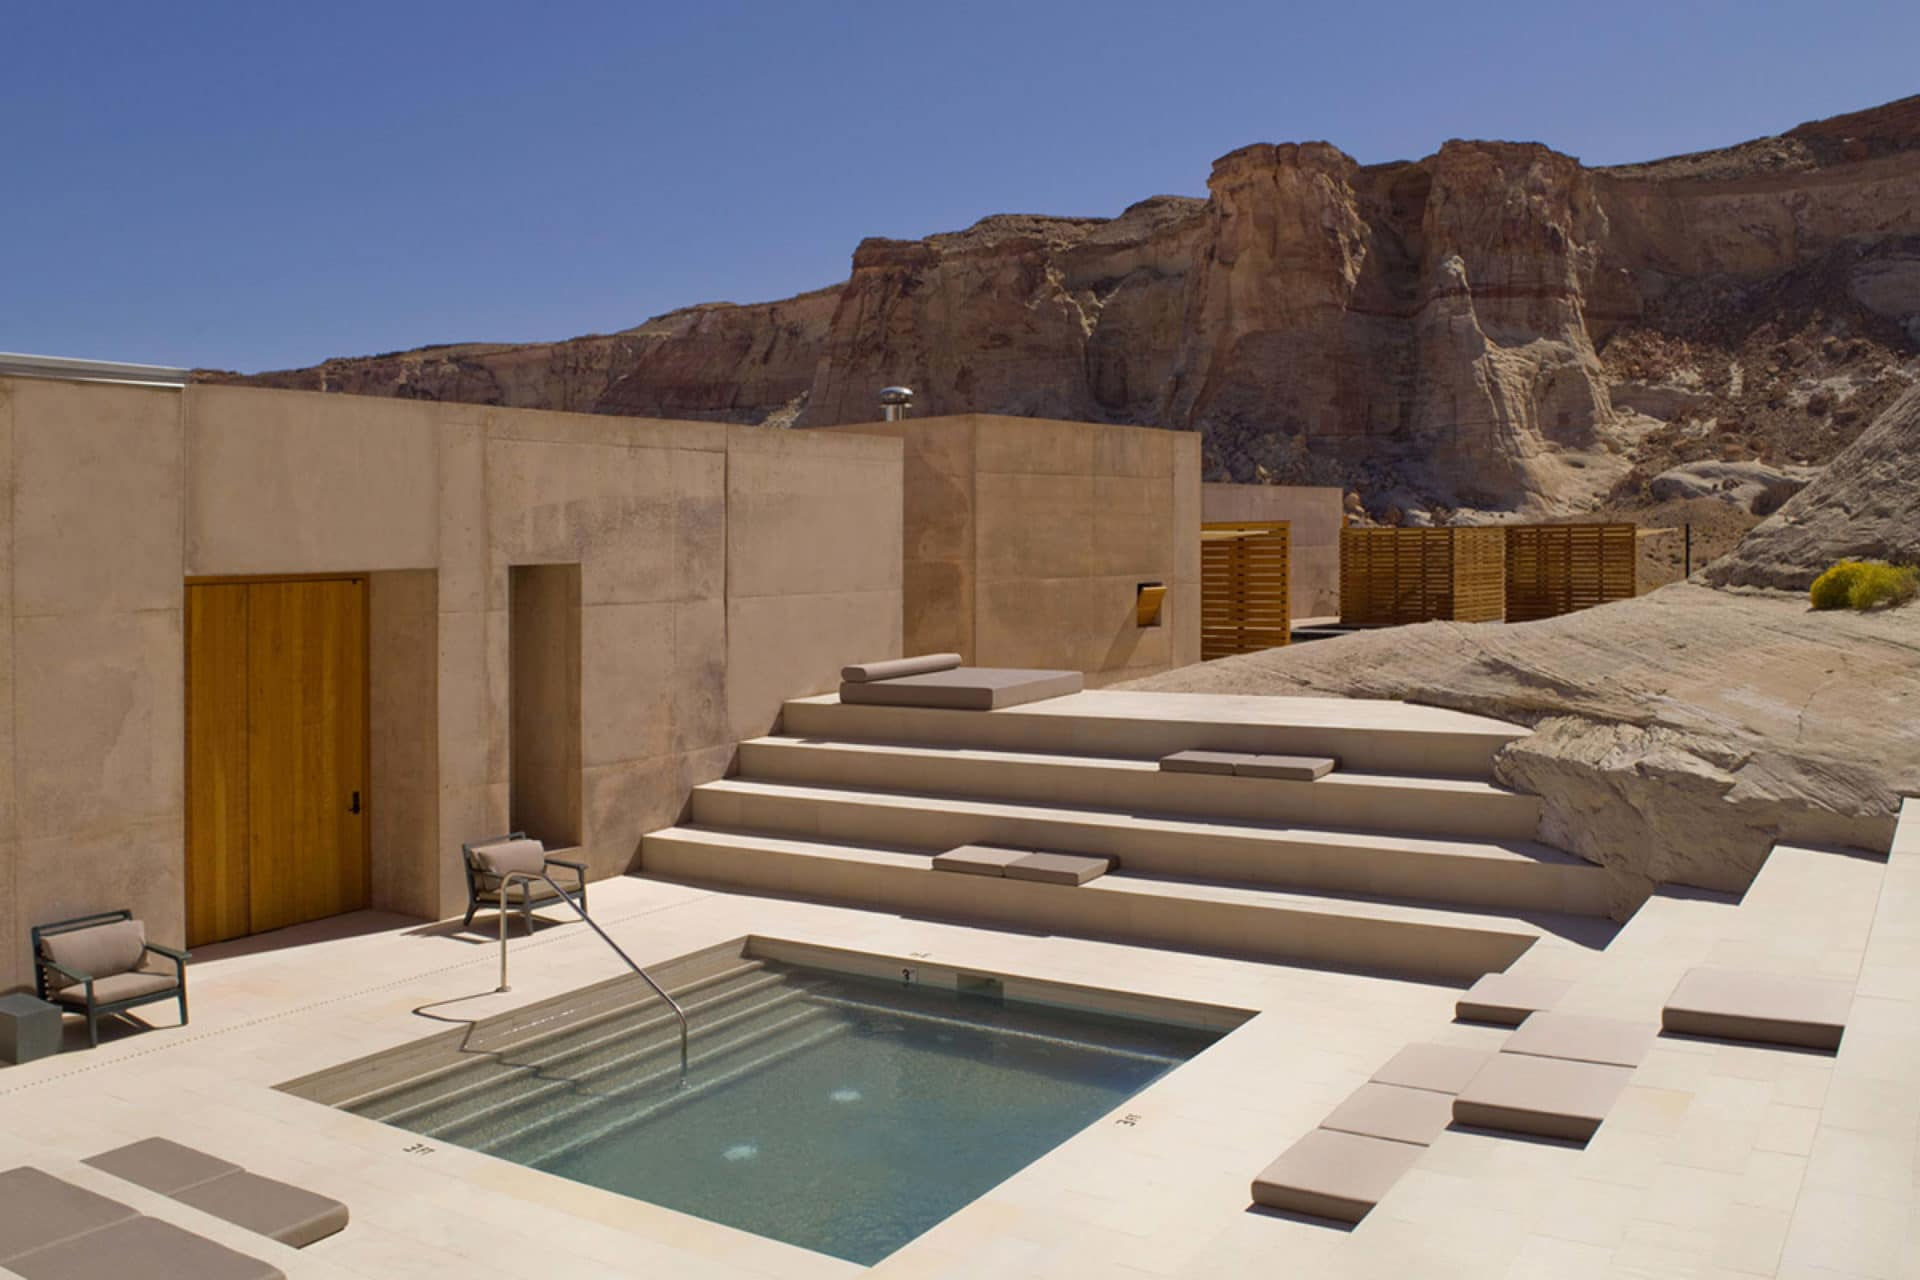 Take A Peek Inside The Luxe Utah Resort Where Idris Elba's Fiancee Threw Her Bachelorette Party